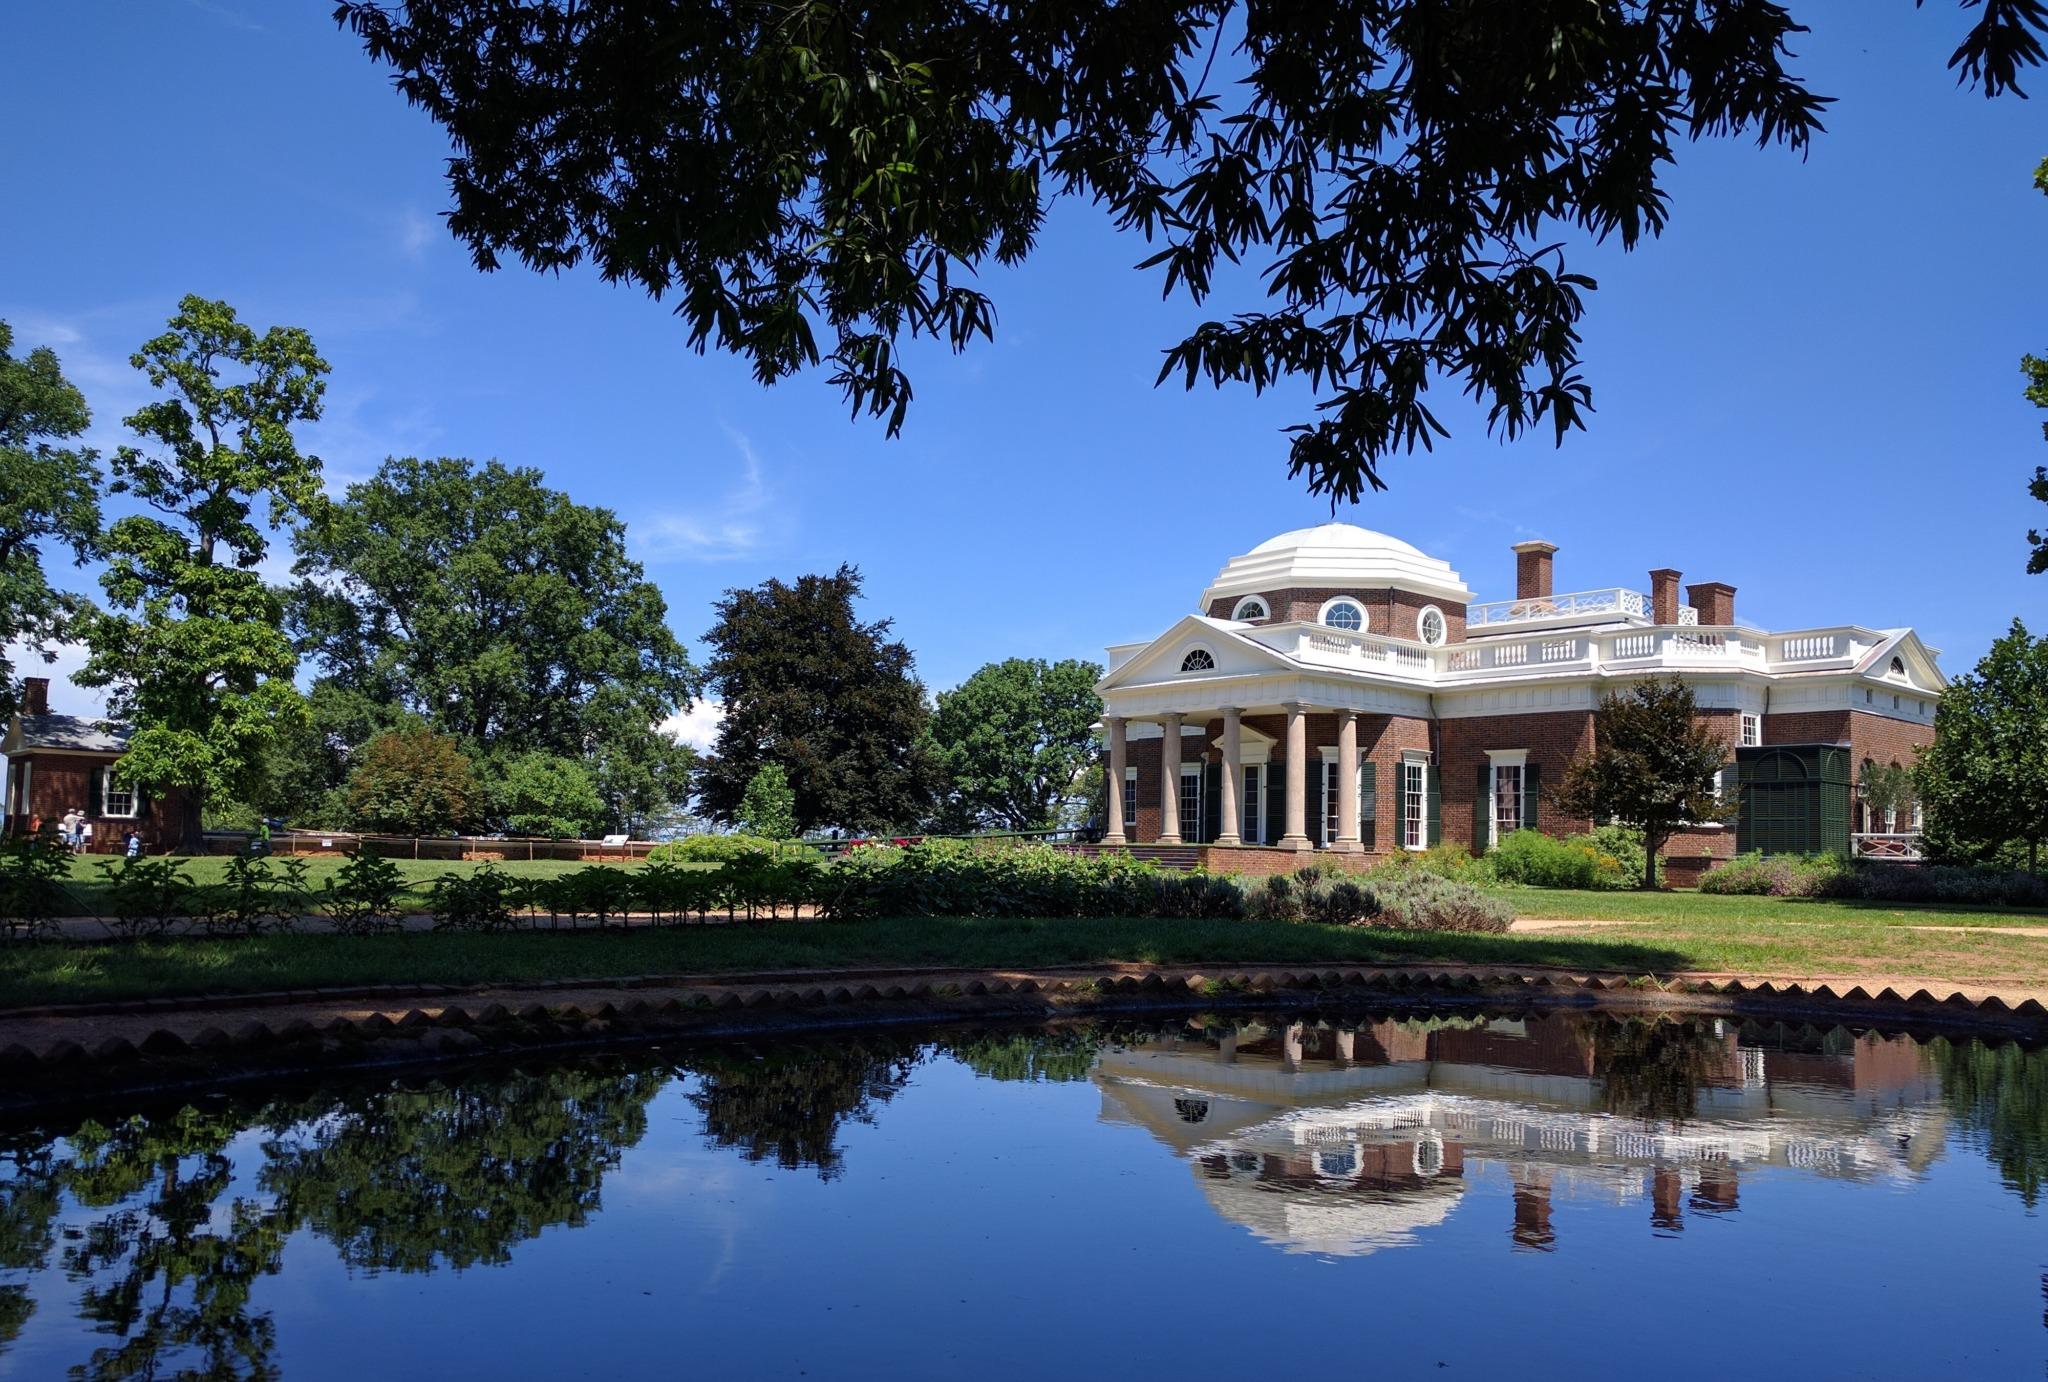 Charlottesville historic building